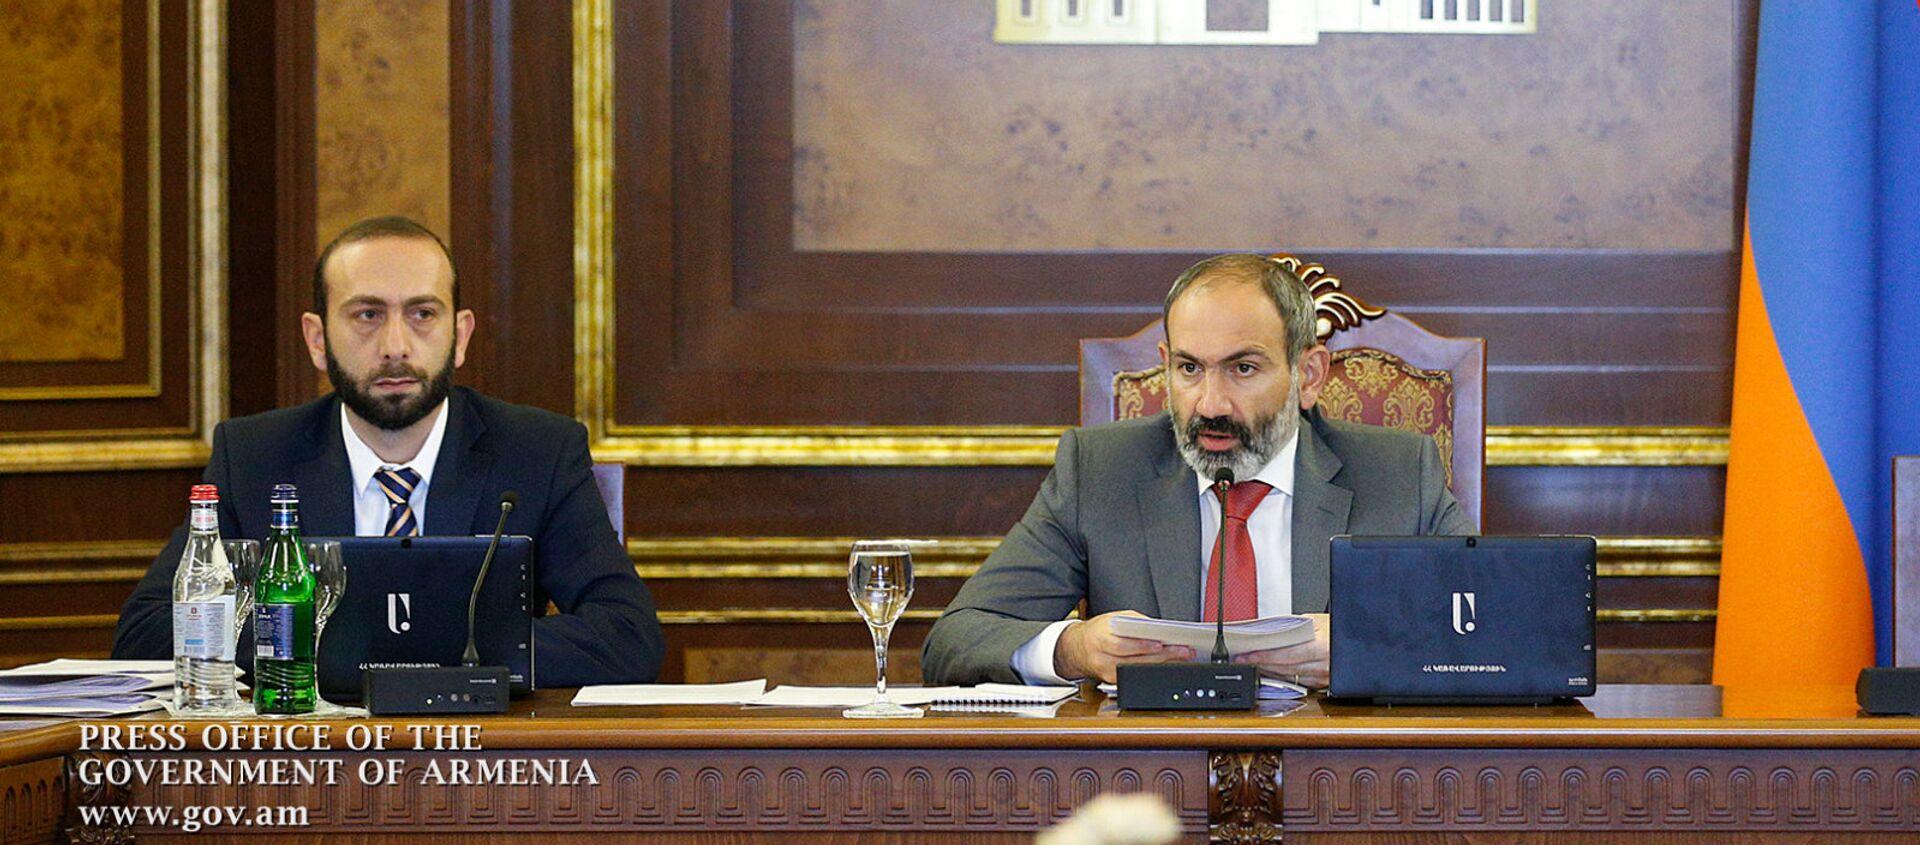 Заседание правительства Армении (4 июля 2018). Ереваn - Sputnik Արմենիա, 1920, 18.08.2021